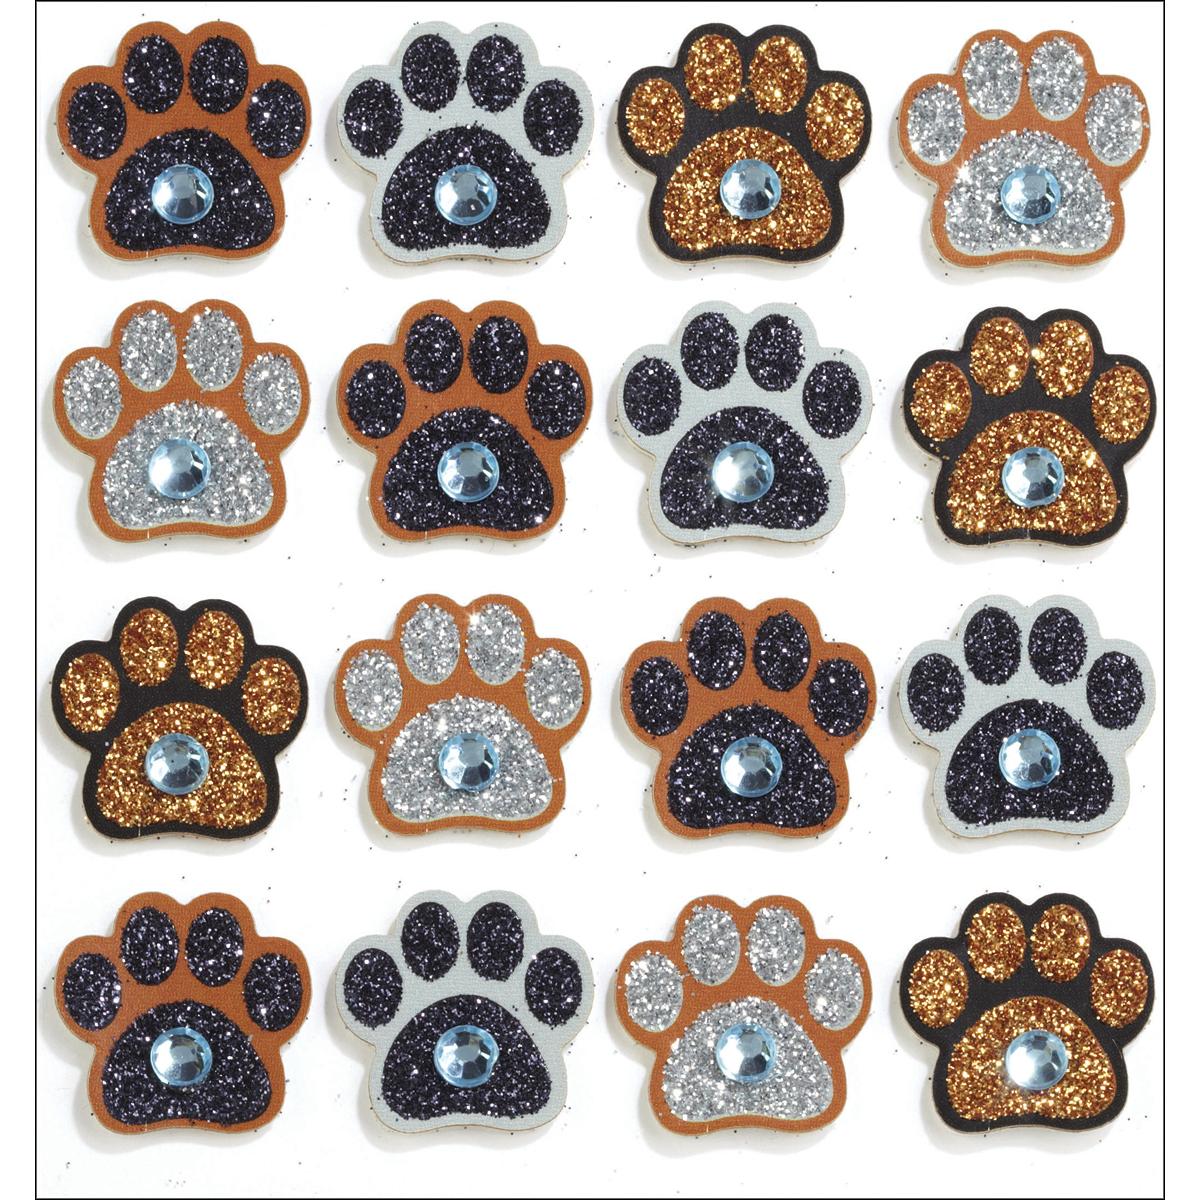 Paw Prints Dimensional Stickers